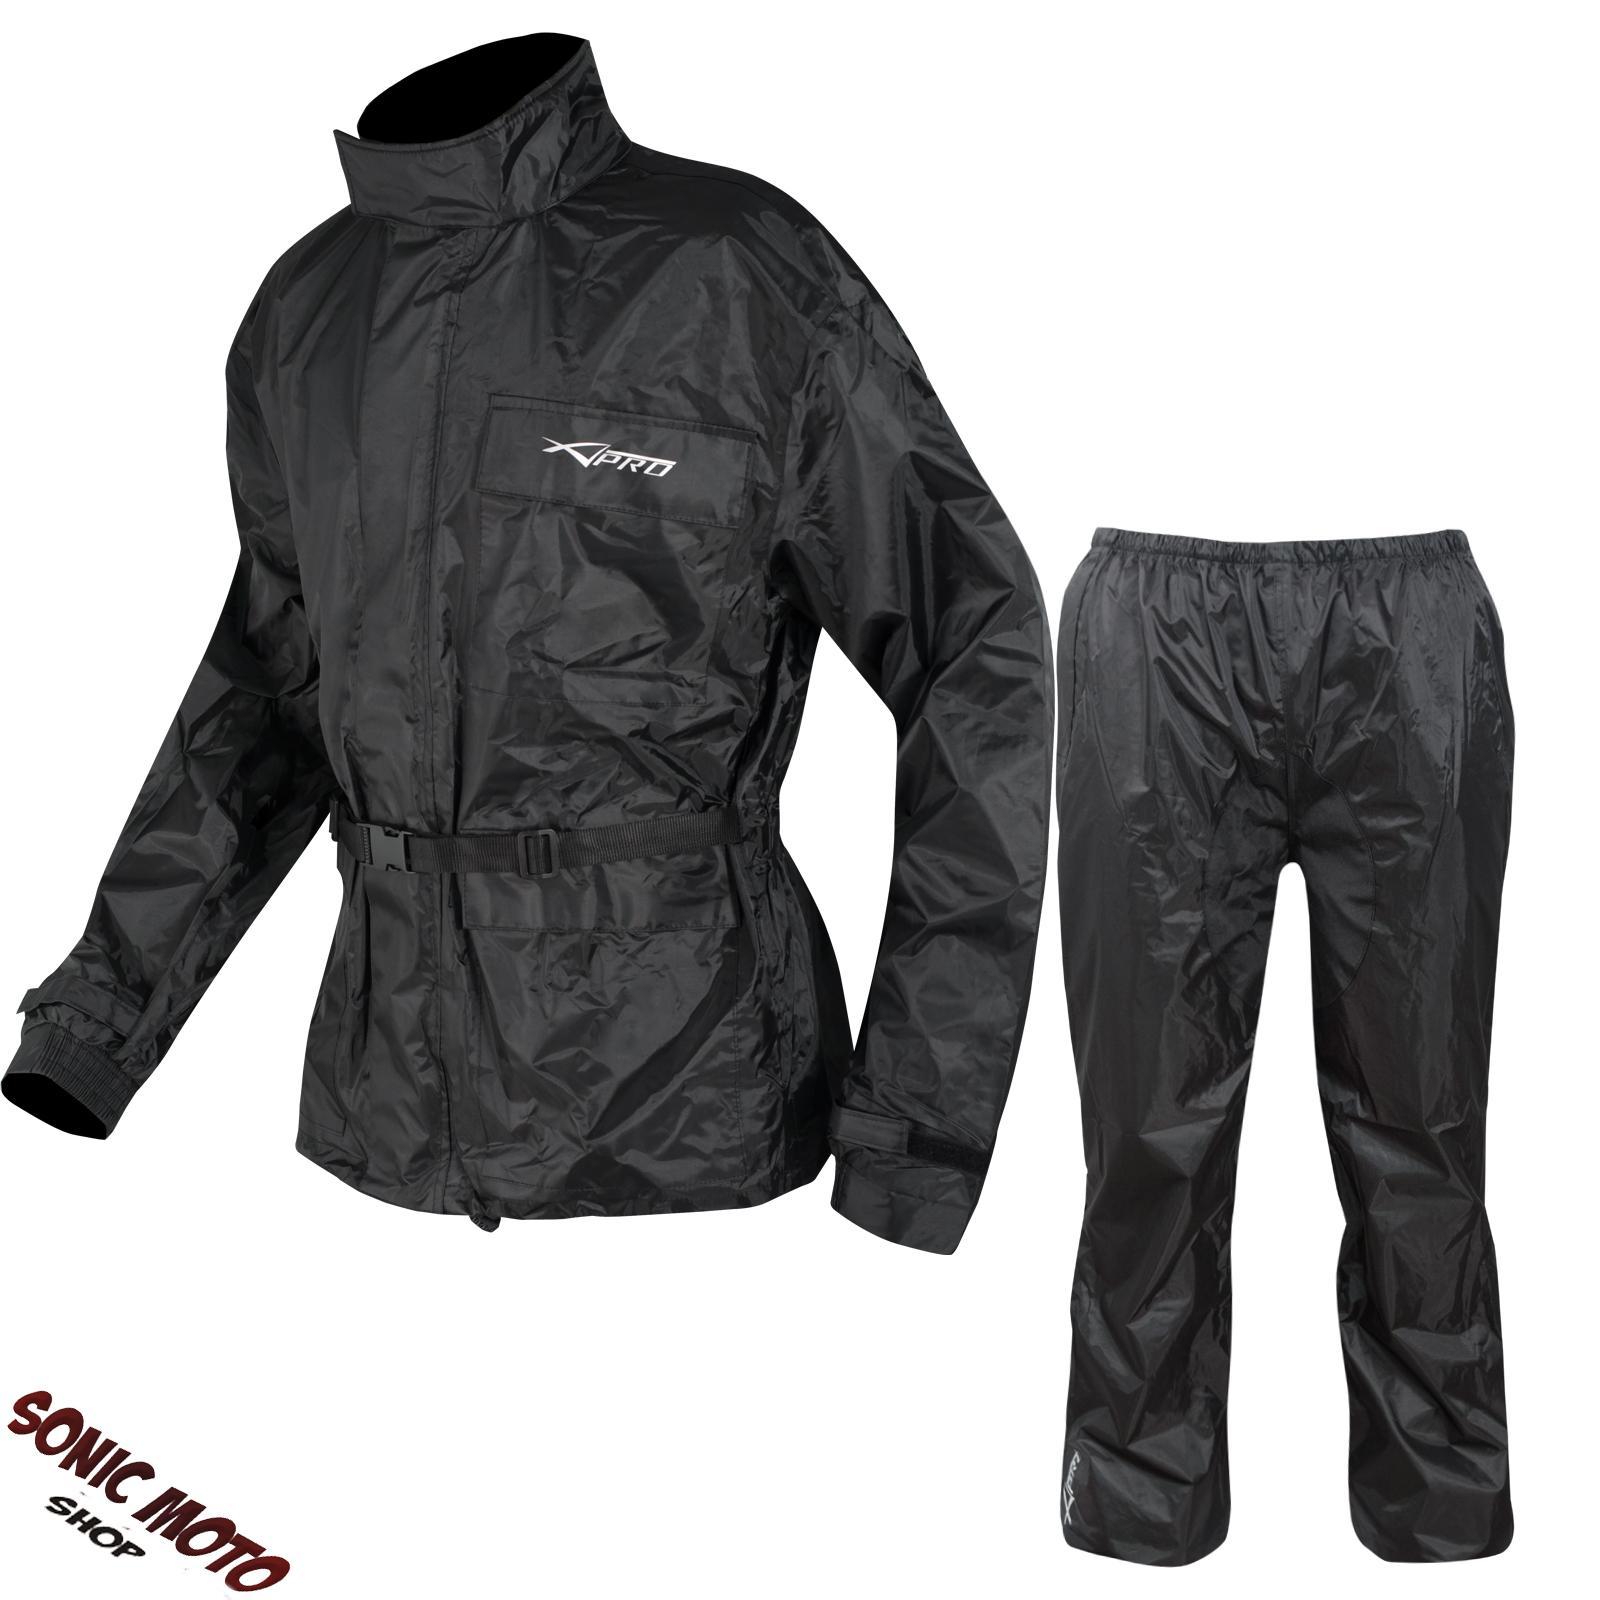 combinaison textile impermeable anti pluie blouson pantalon moto motard touring ebay. Black Bedroom Furniture Sets. Home Design Ideas